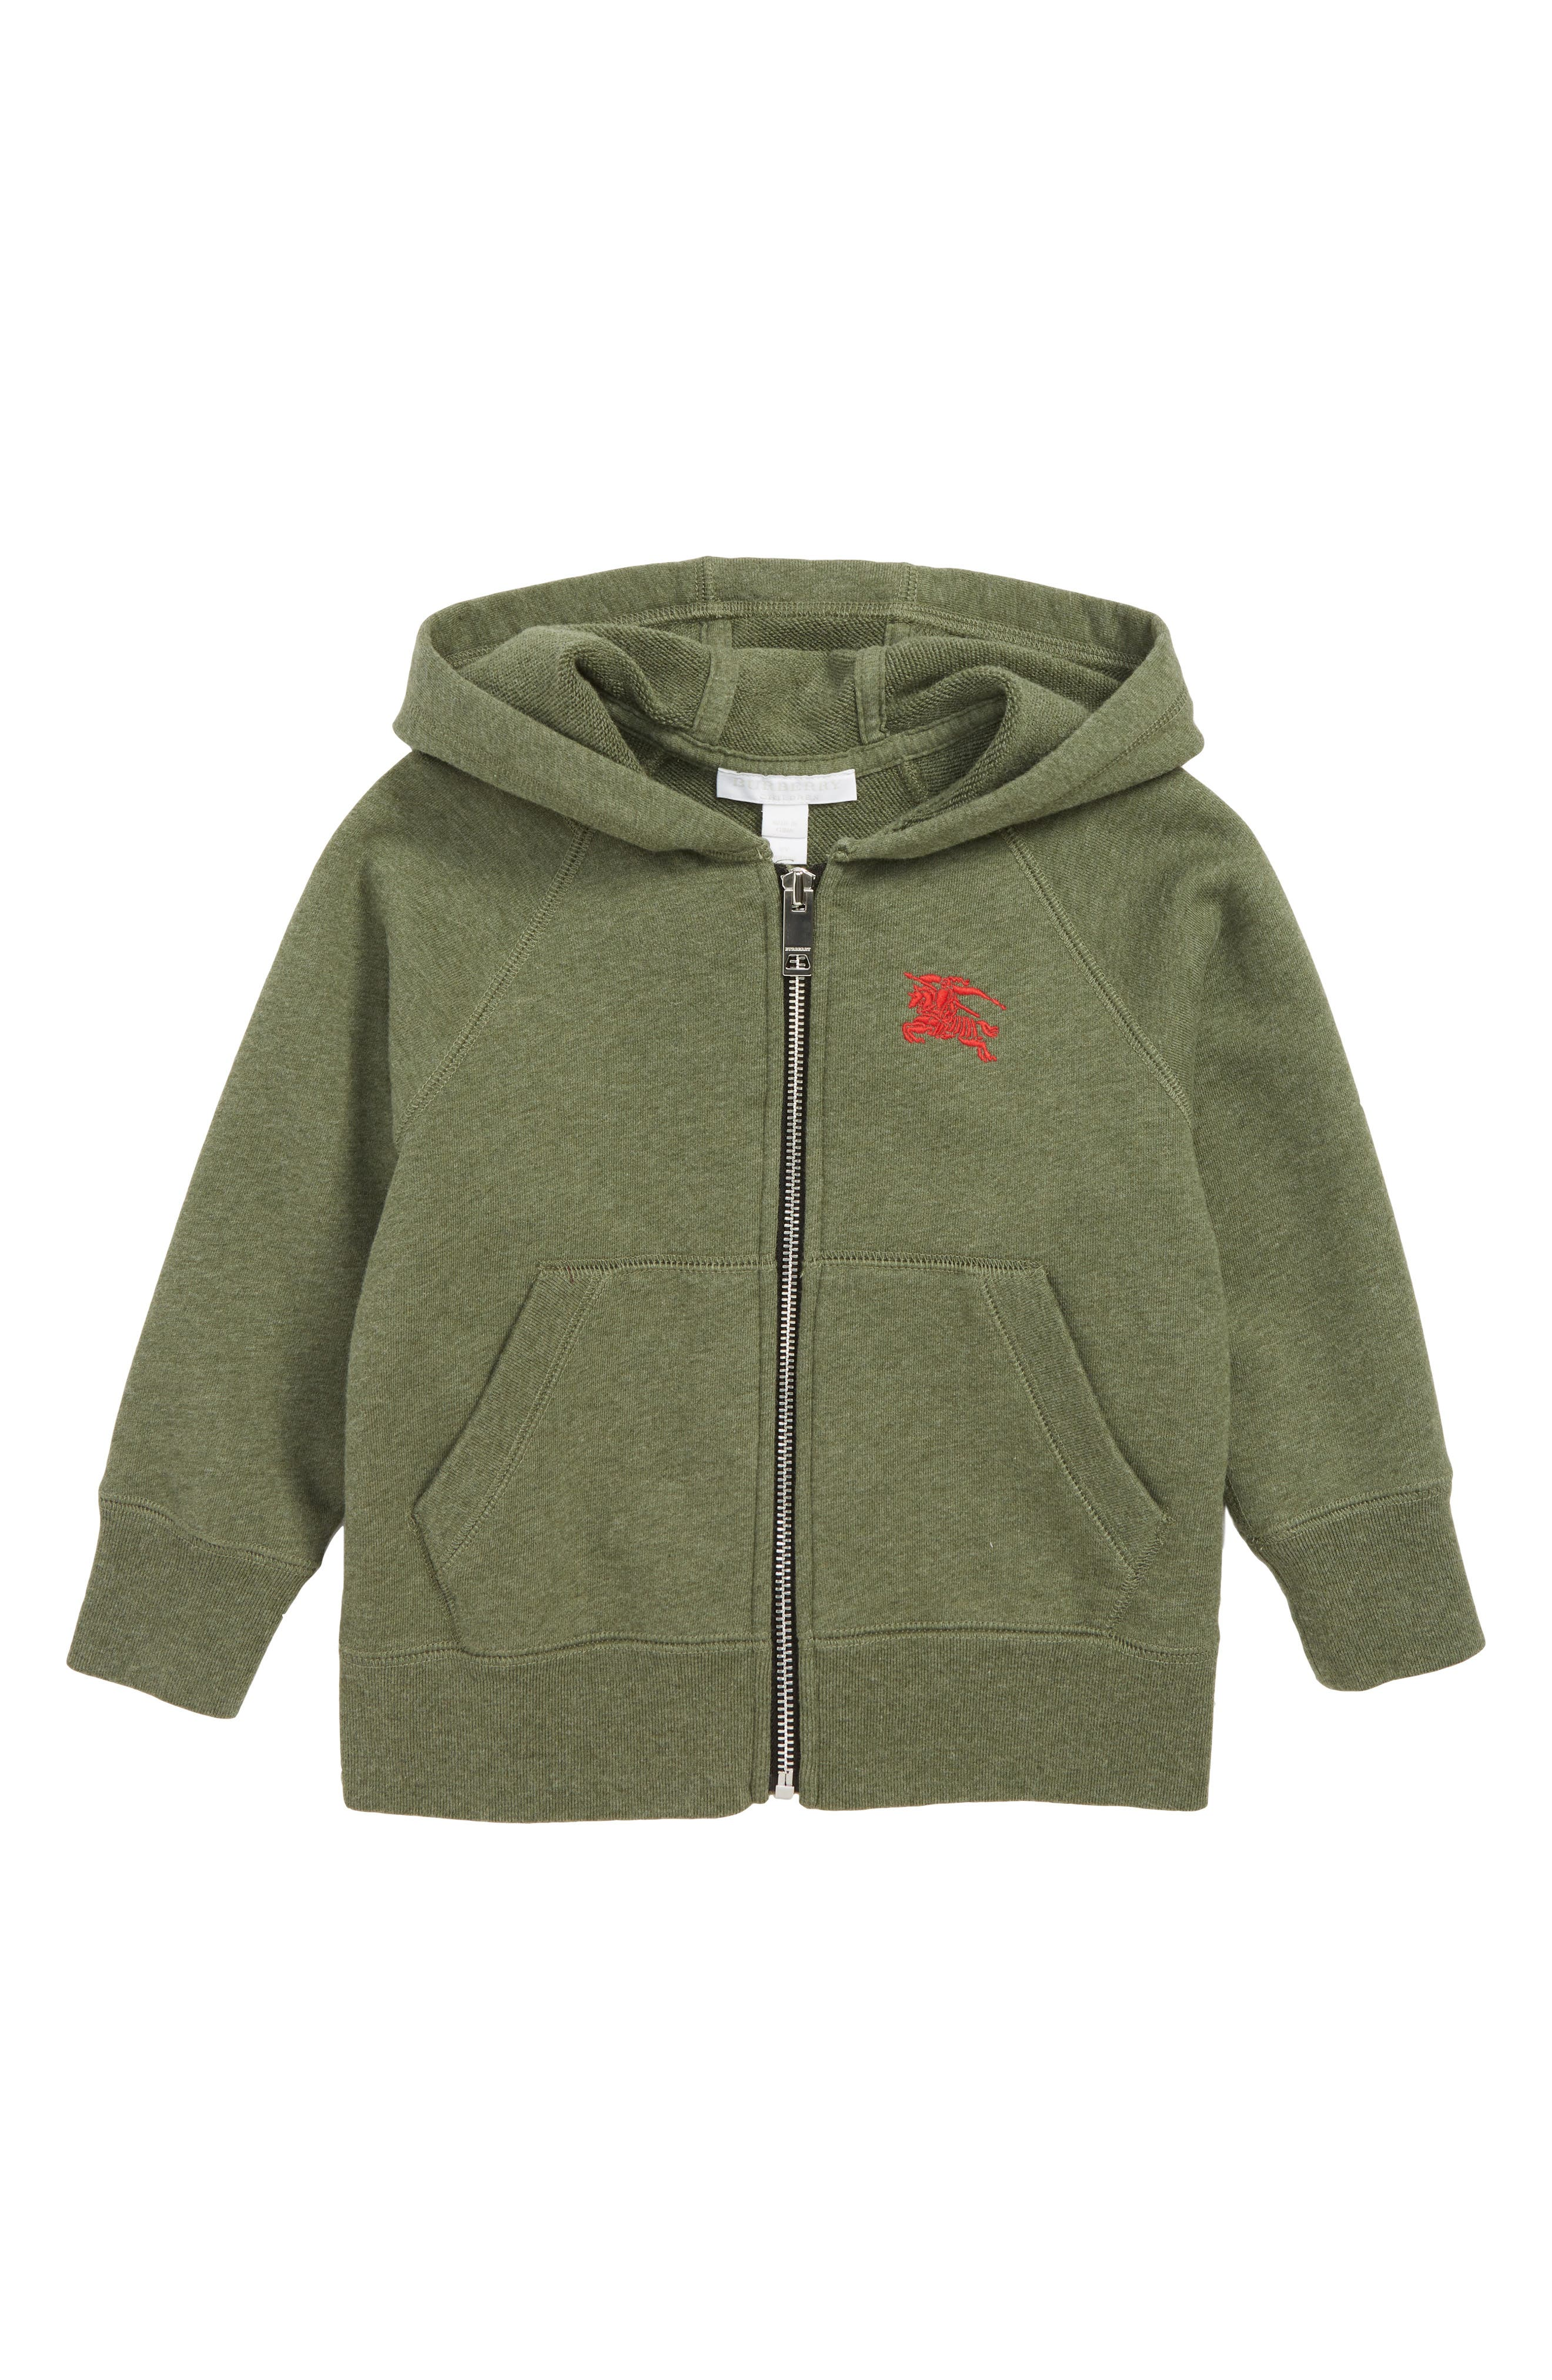 Toddler Boys Burberry Gunther Zip Hoodie Size 4Y  Green